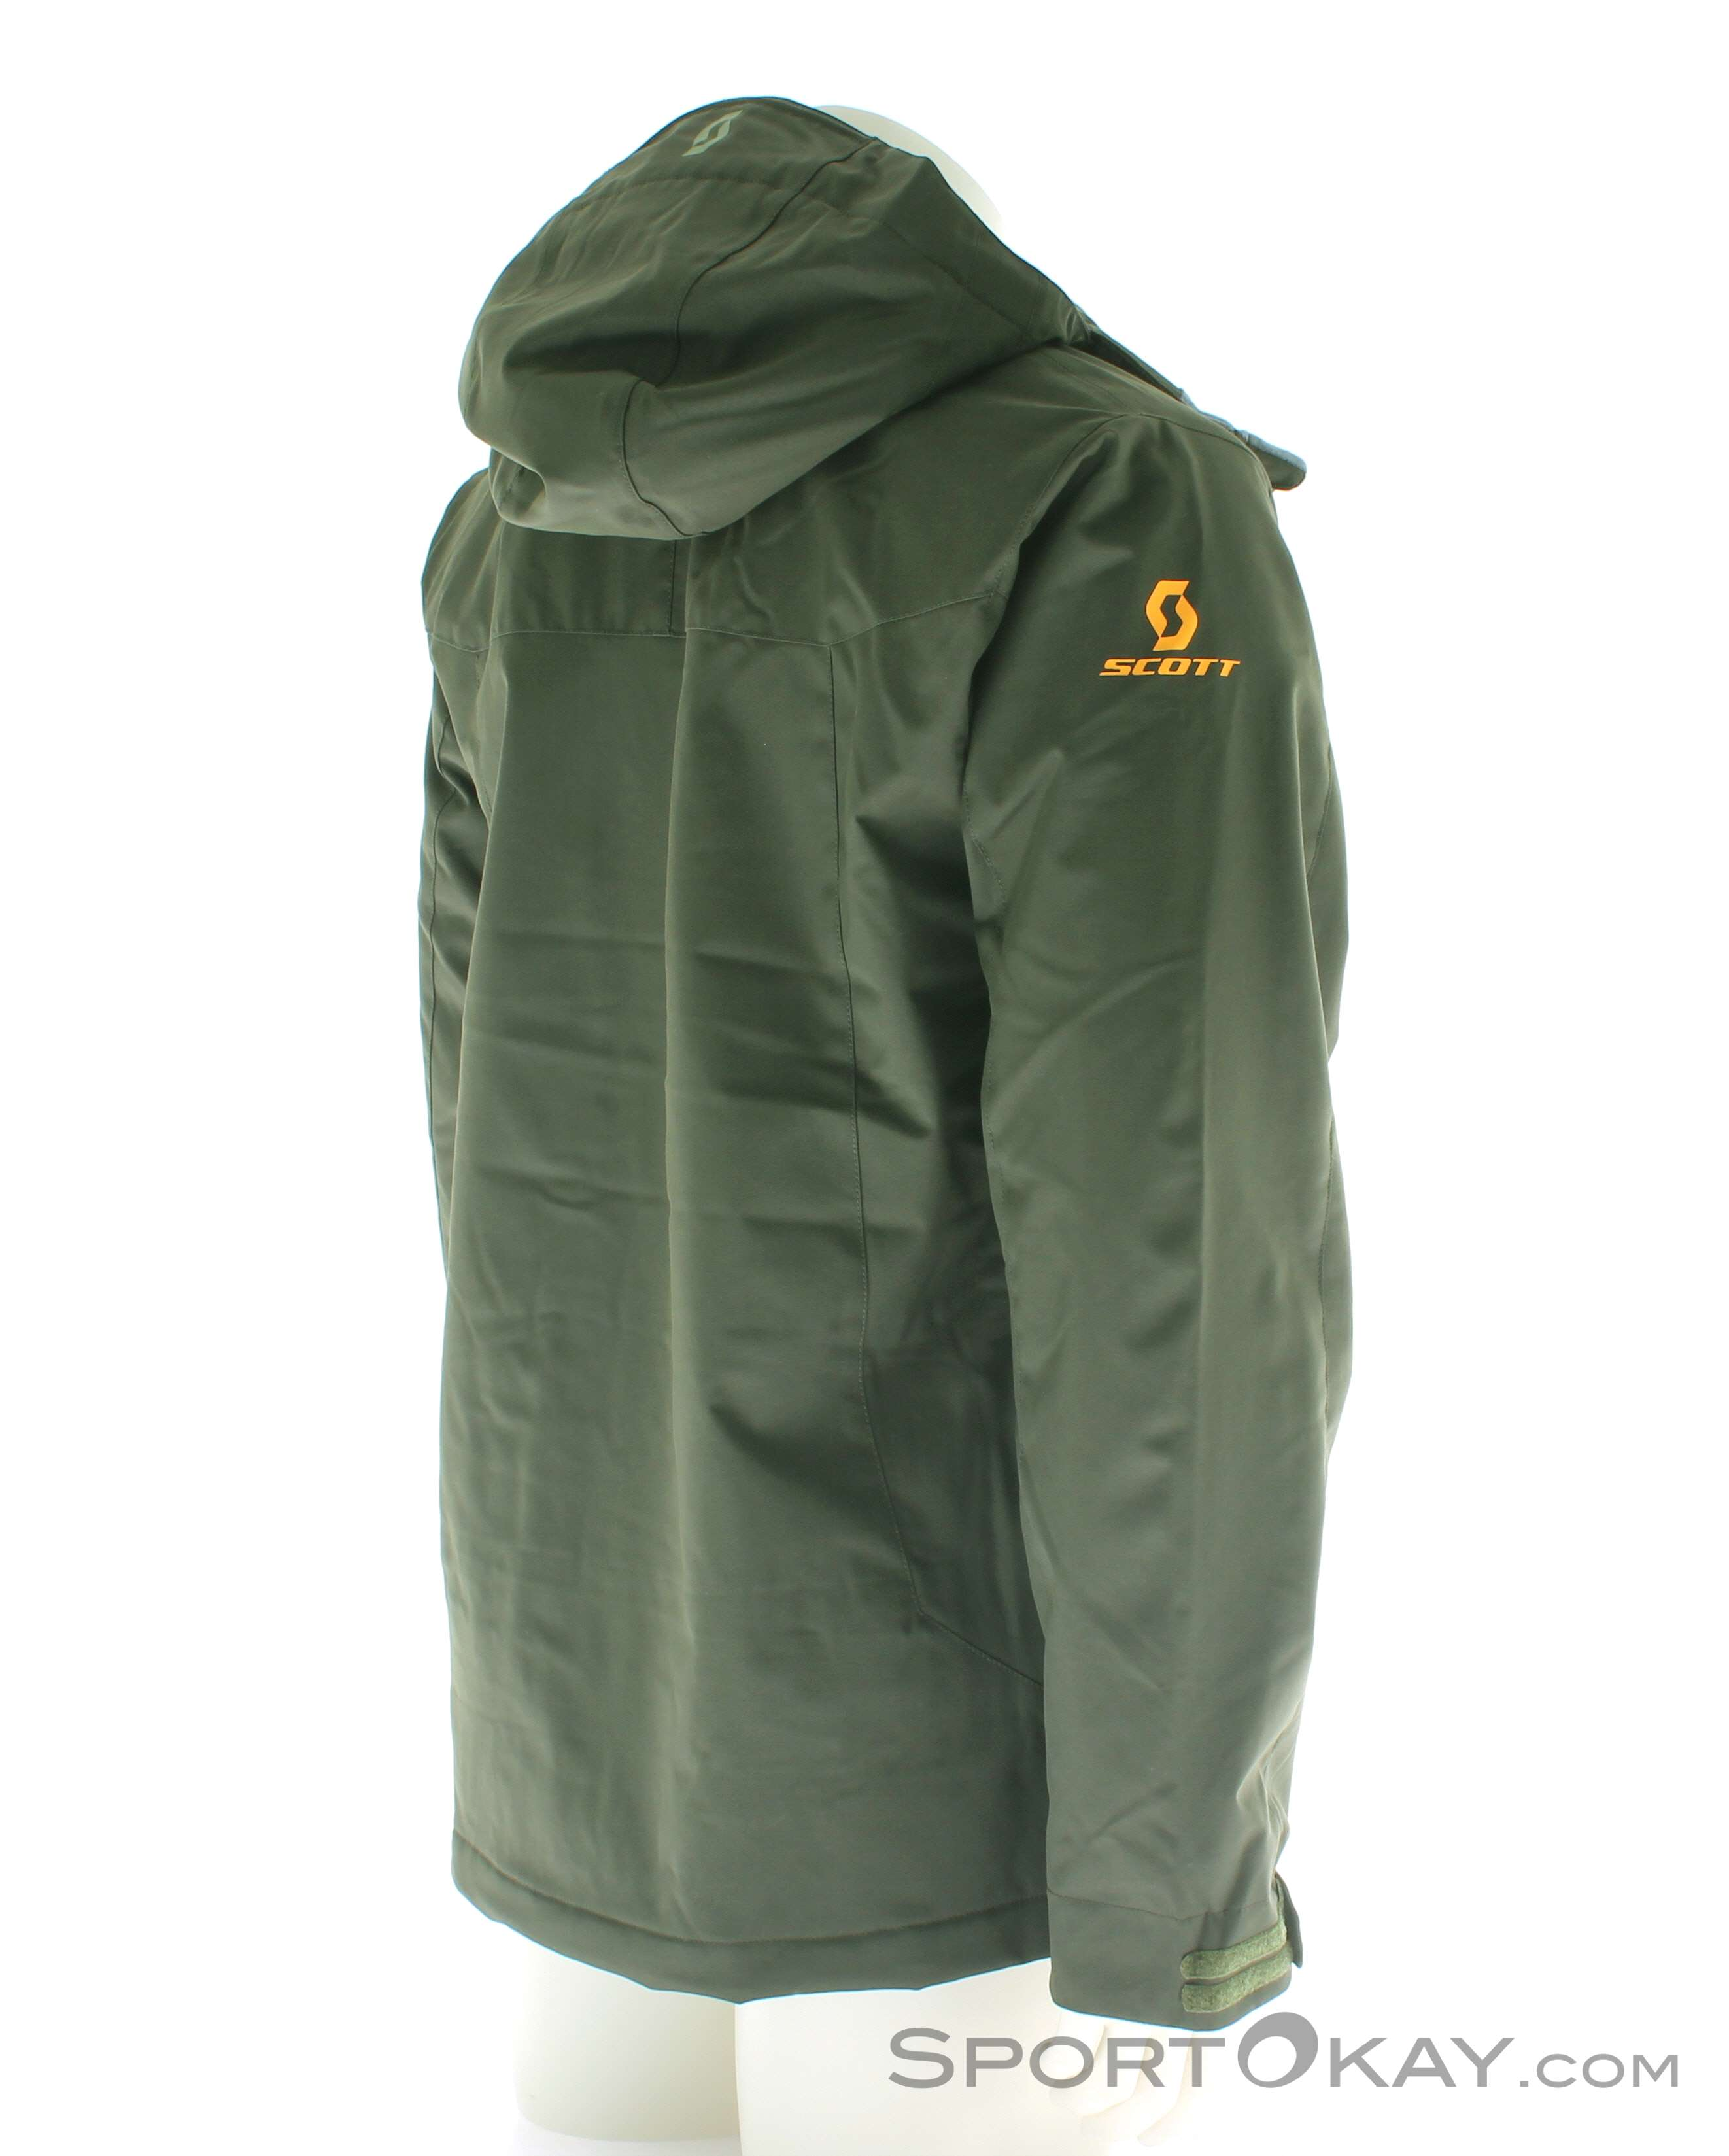 scott cornell ski jacket mens ski jackets ski clothing. Black Bedroom Furniture Sets. Home Design Ideas